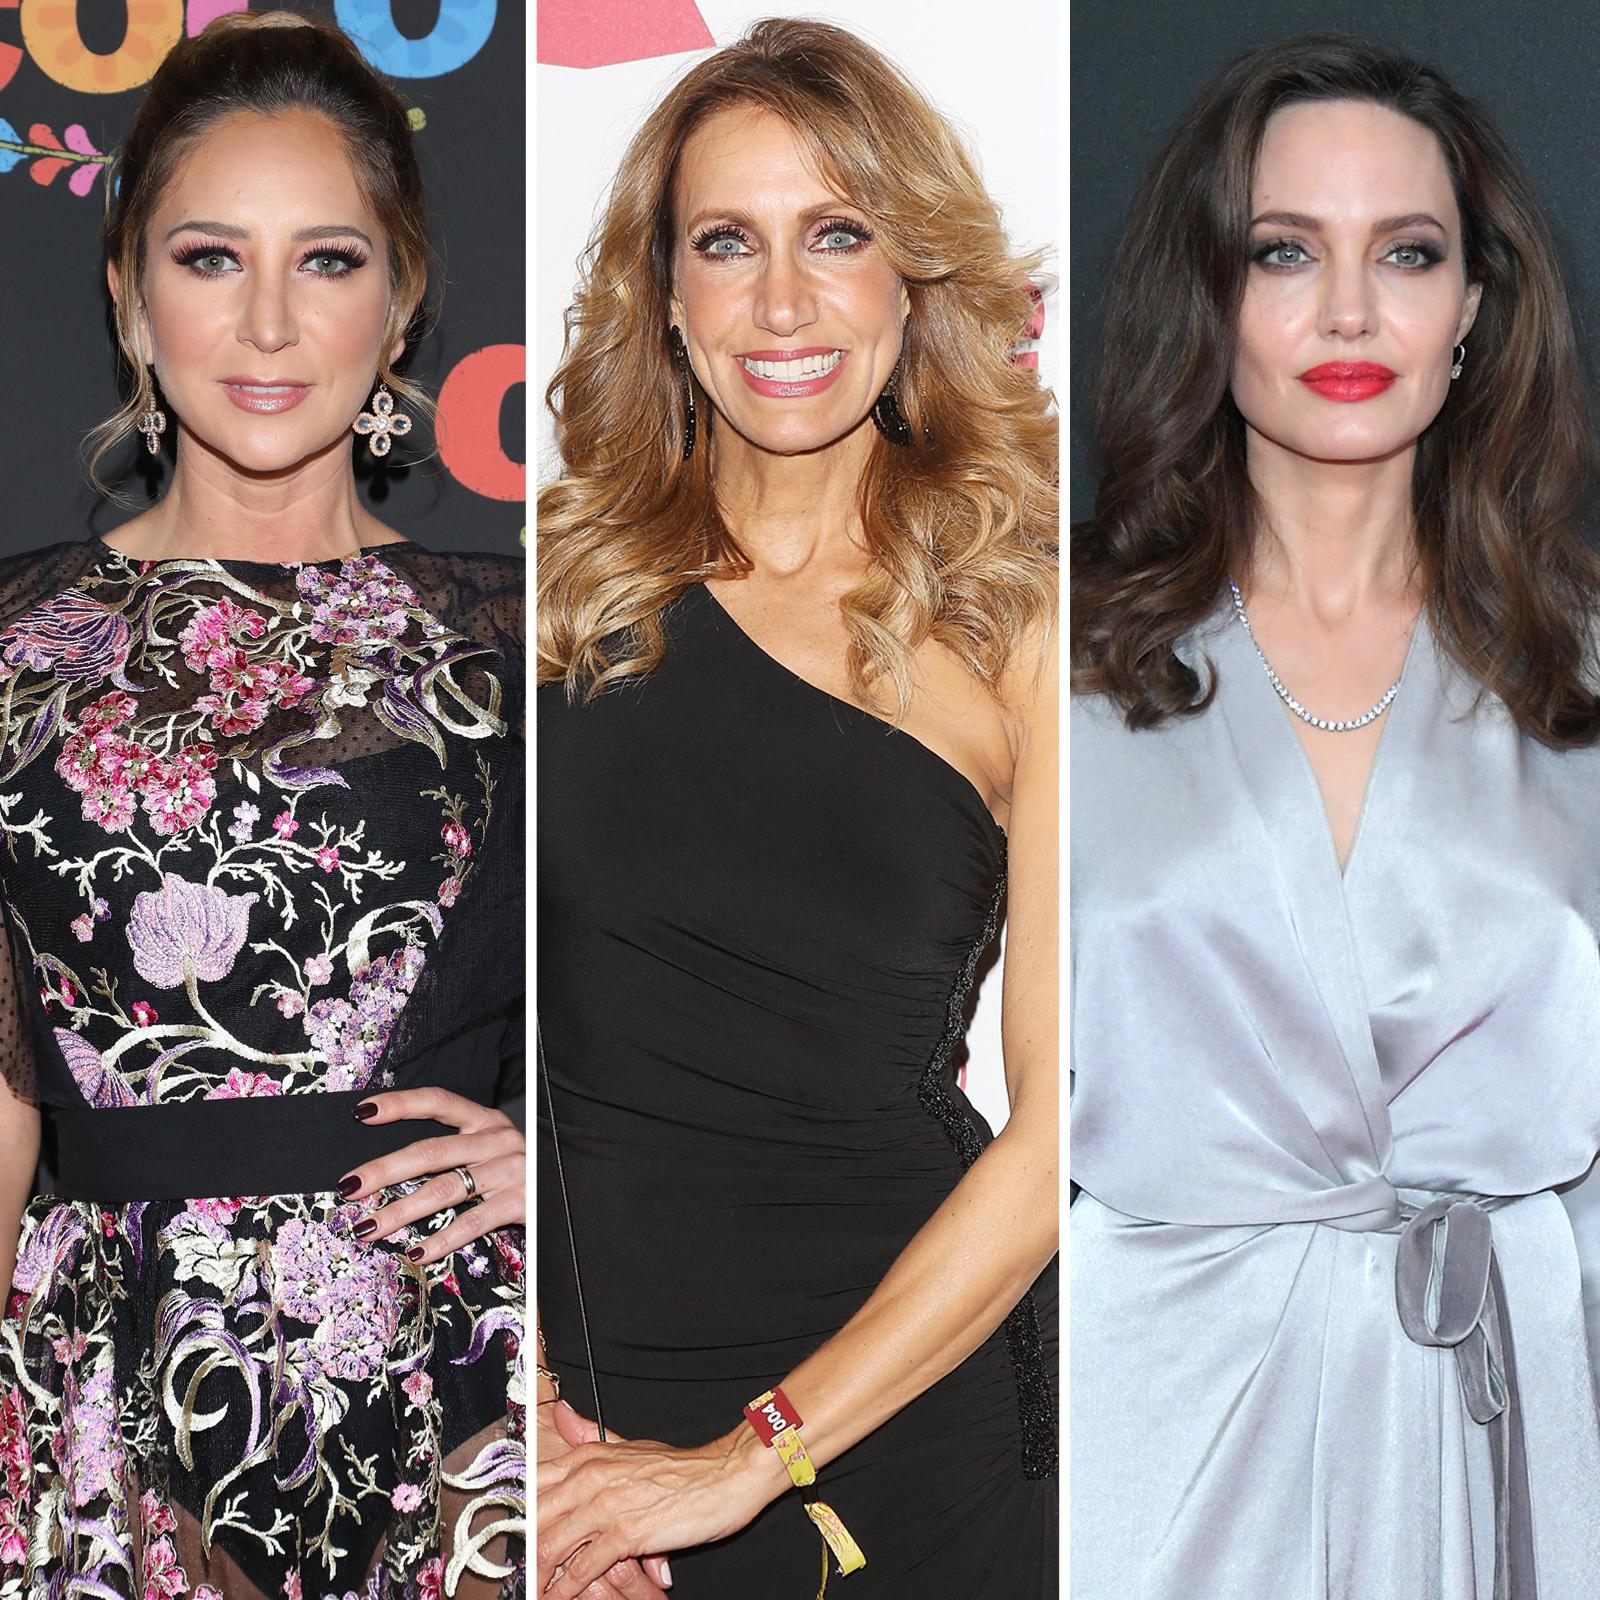 Geraldine Bazán, Lili Estefan y Angelina Jolie